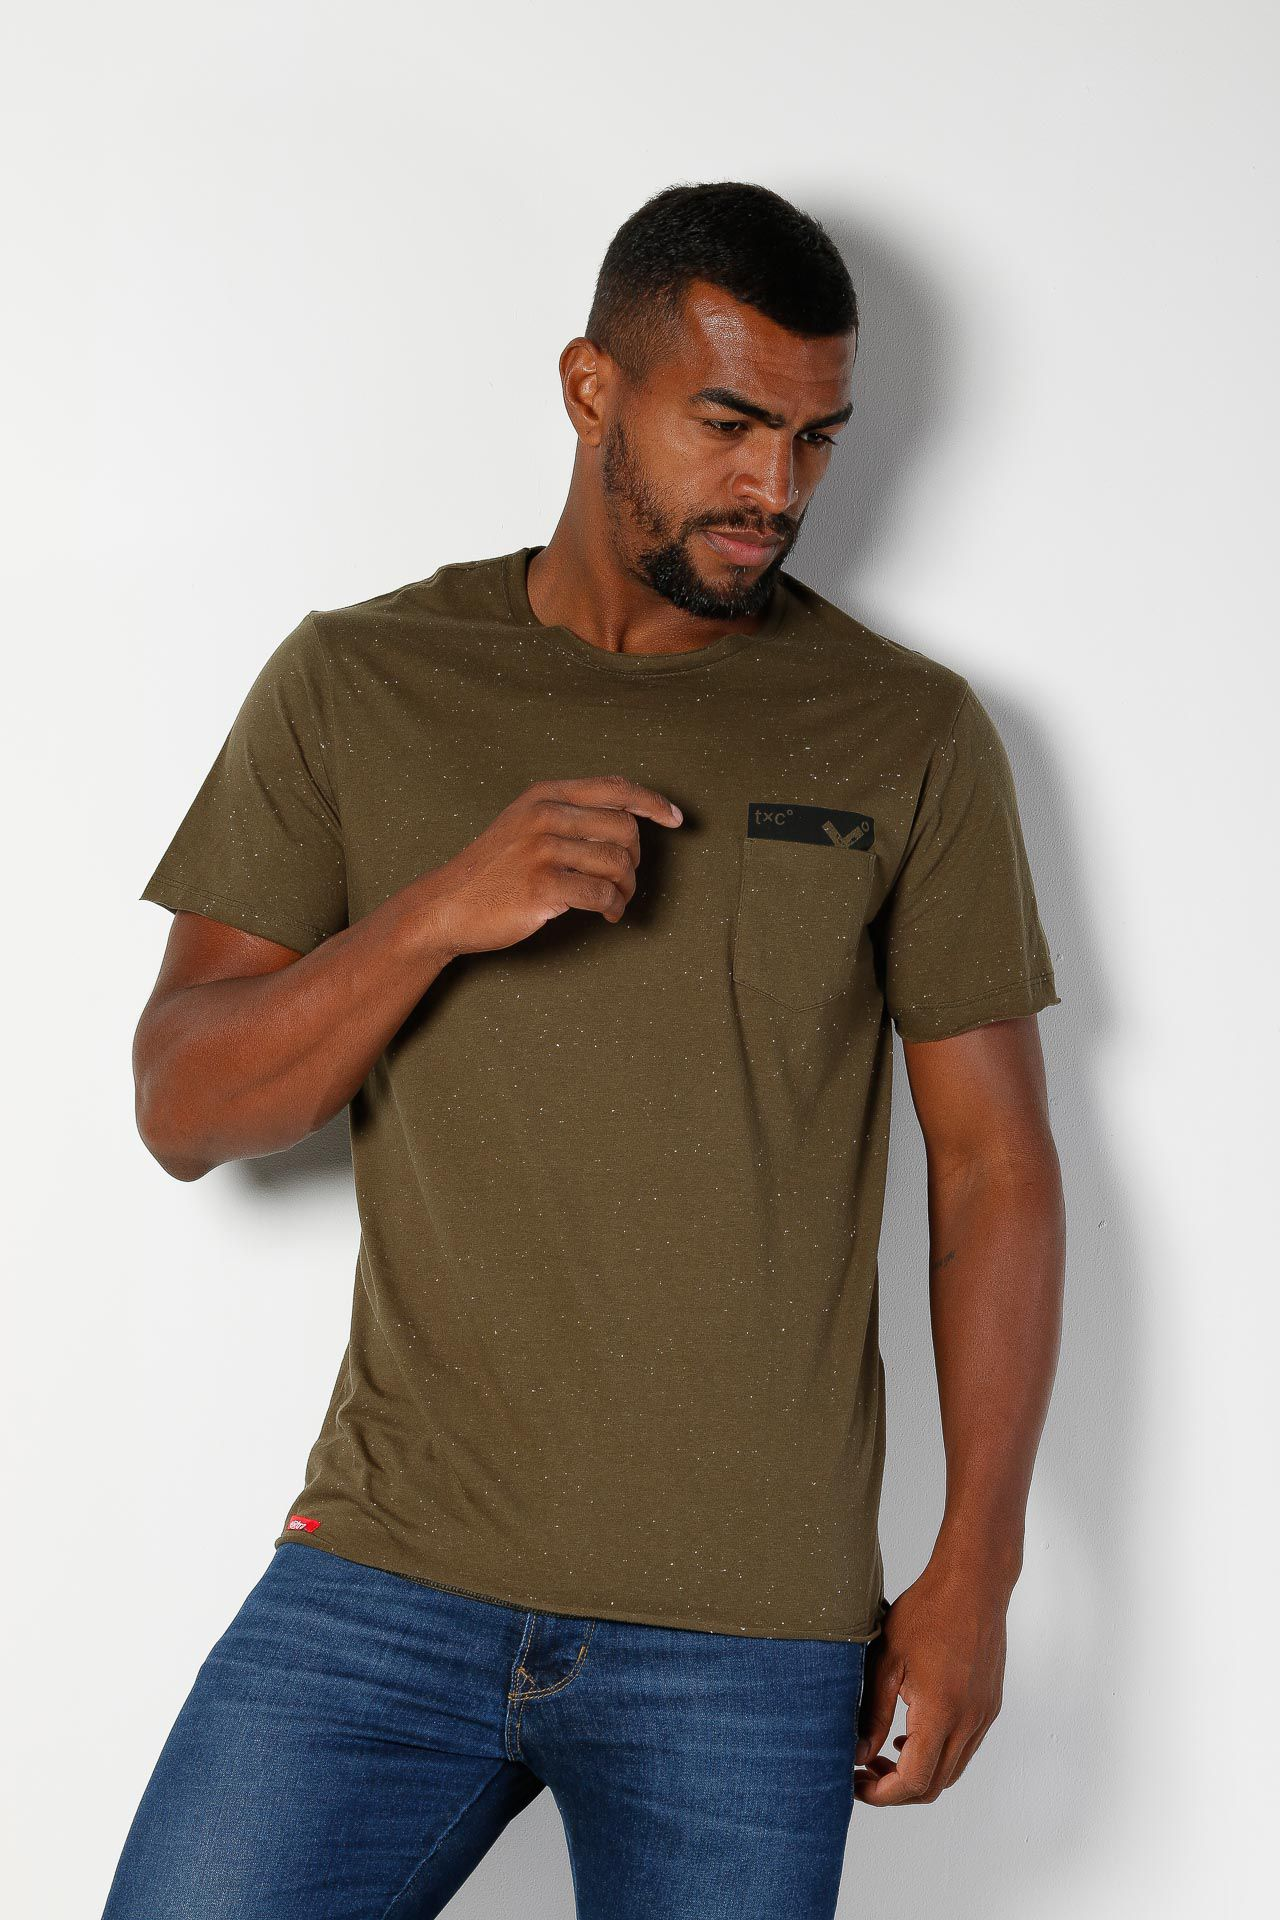 Camiseta Masculina TXC Brand Botone 1976